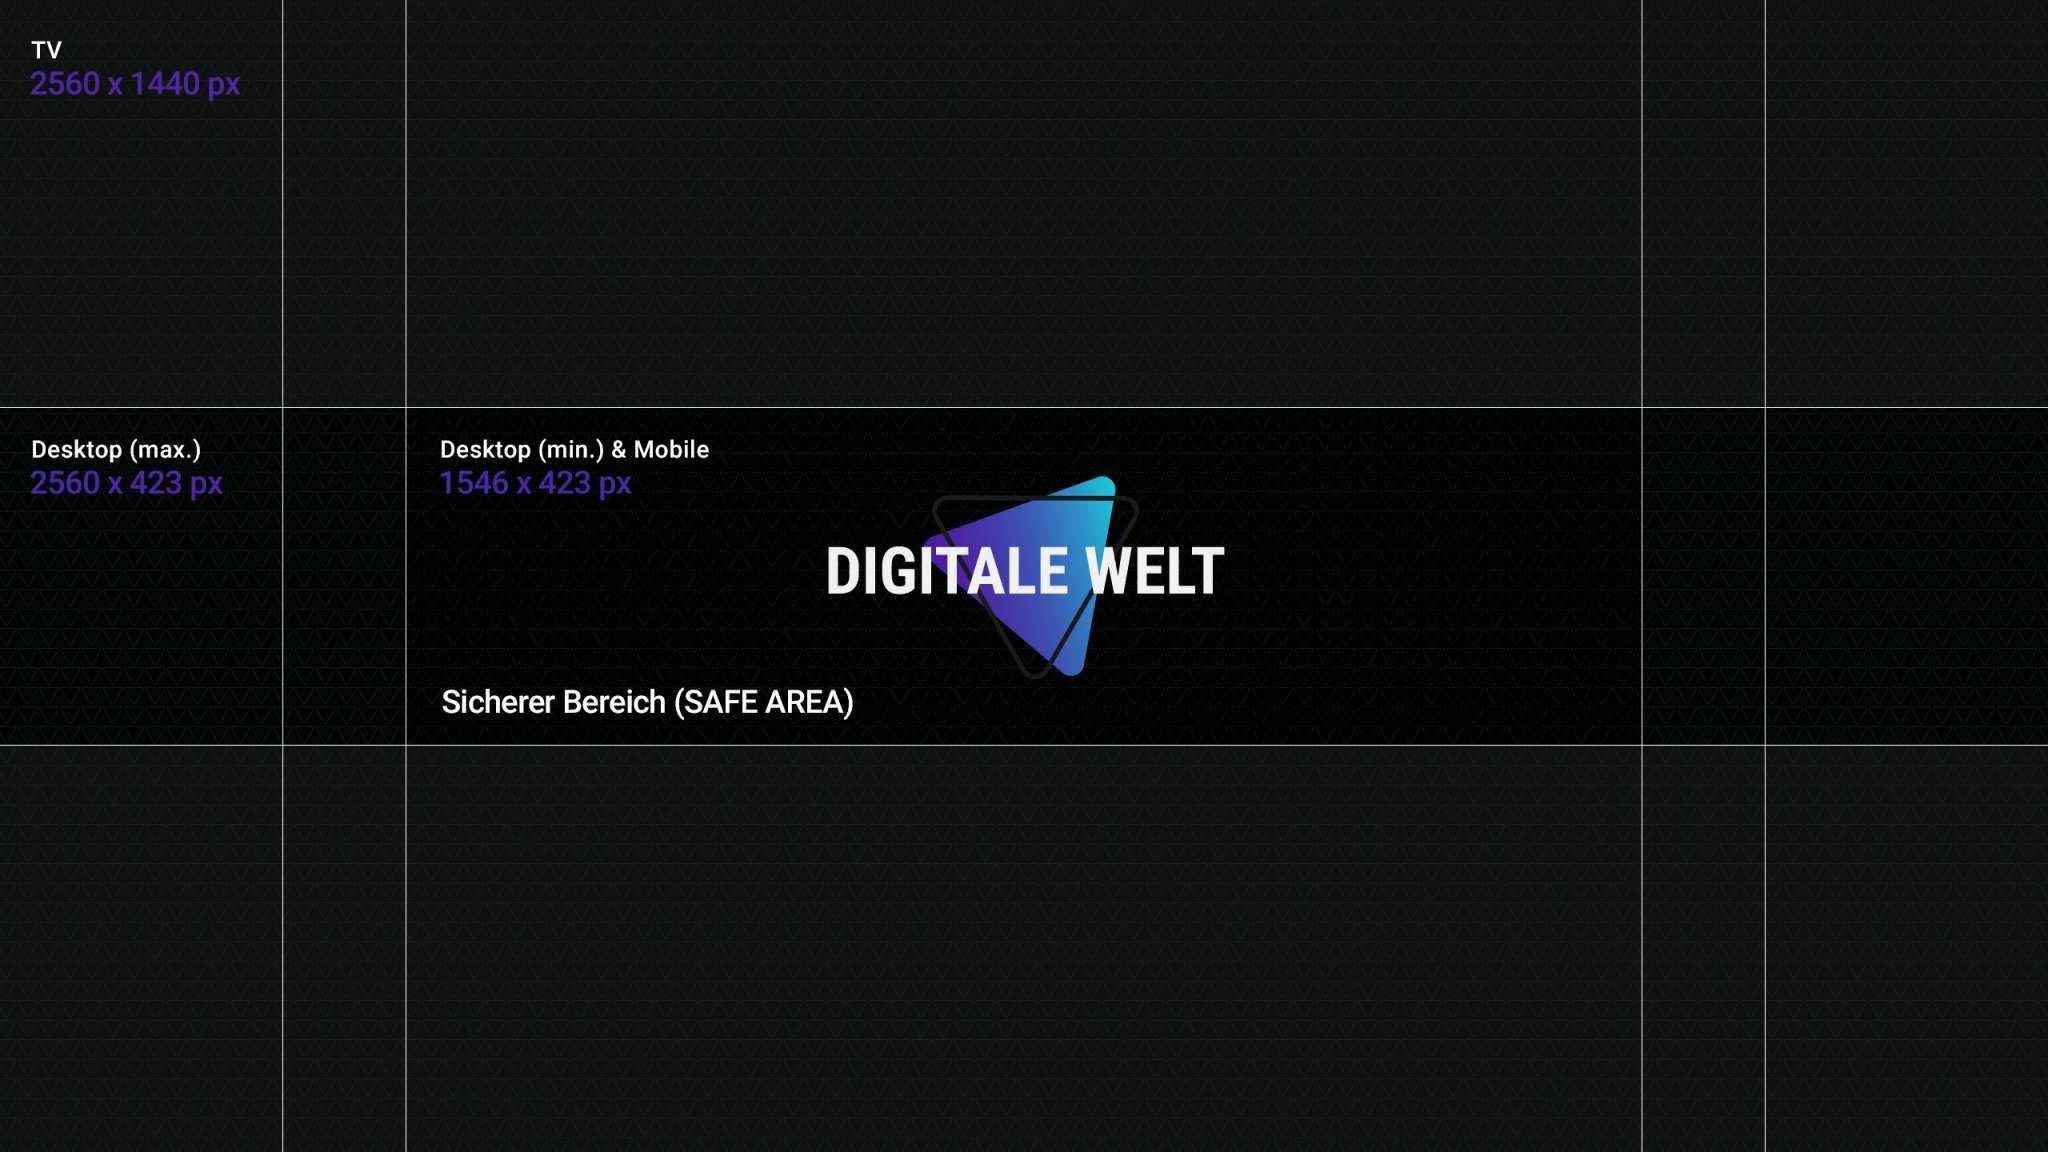 Youtube Kanalbild Template 2018 Digitalewelt Youtube Kanalbild